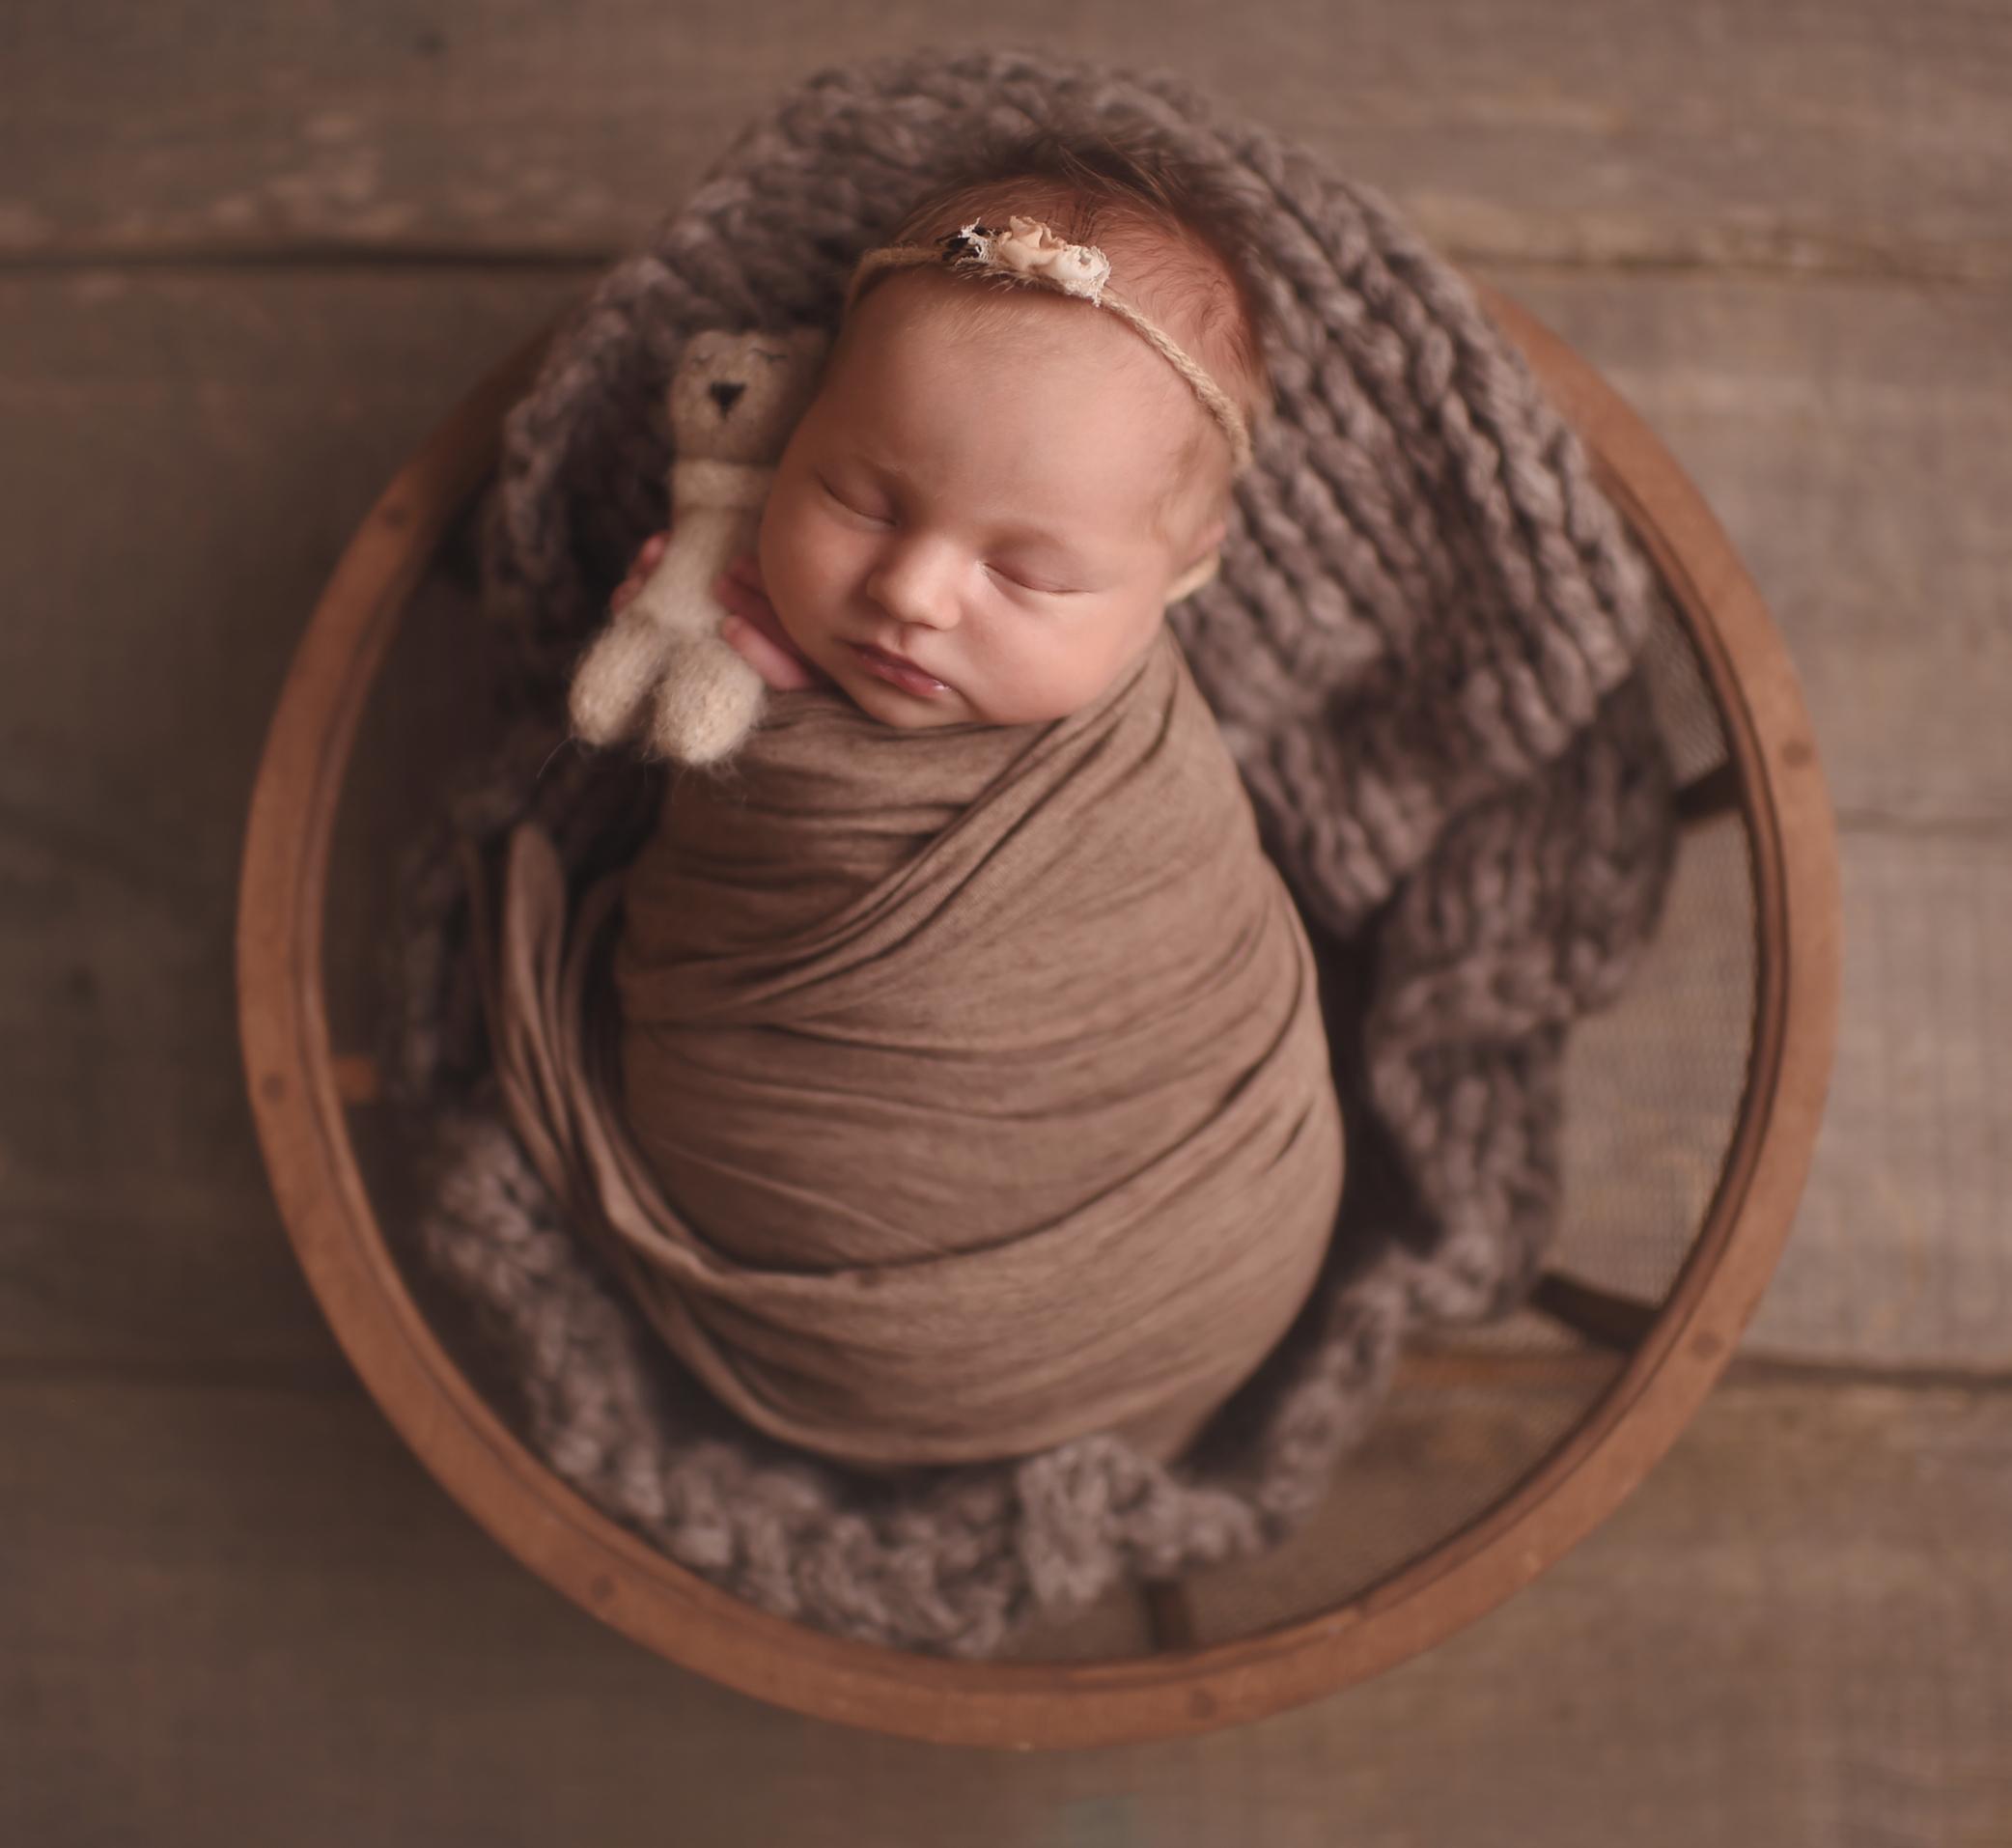 newborn baby girl in the wooden basket